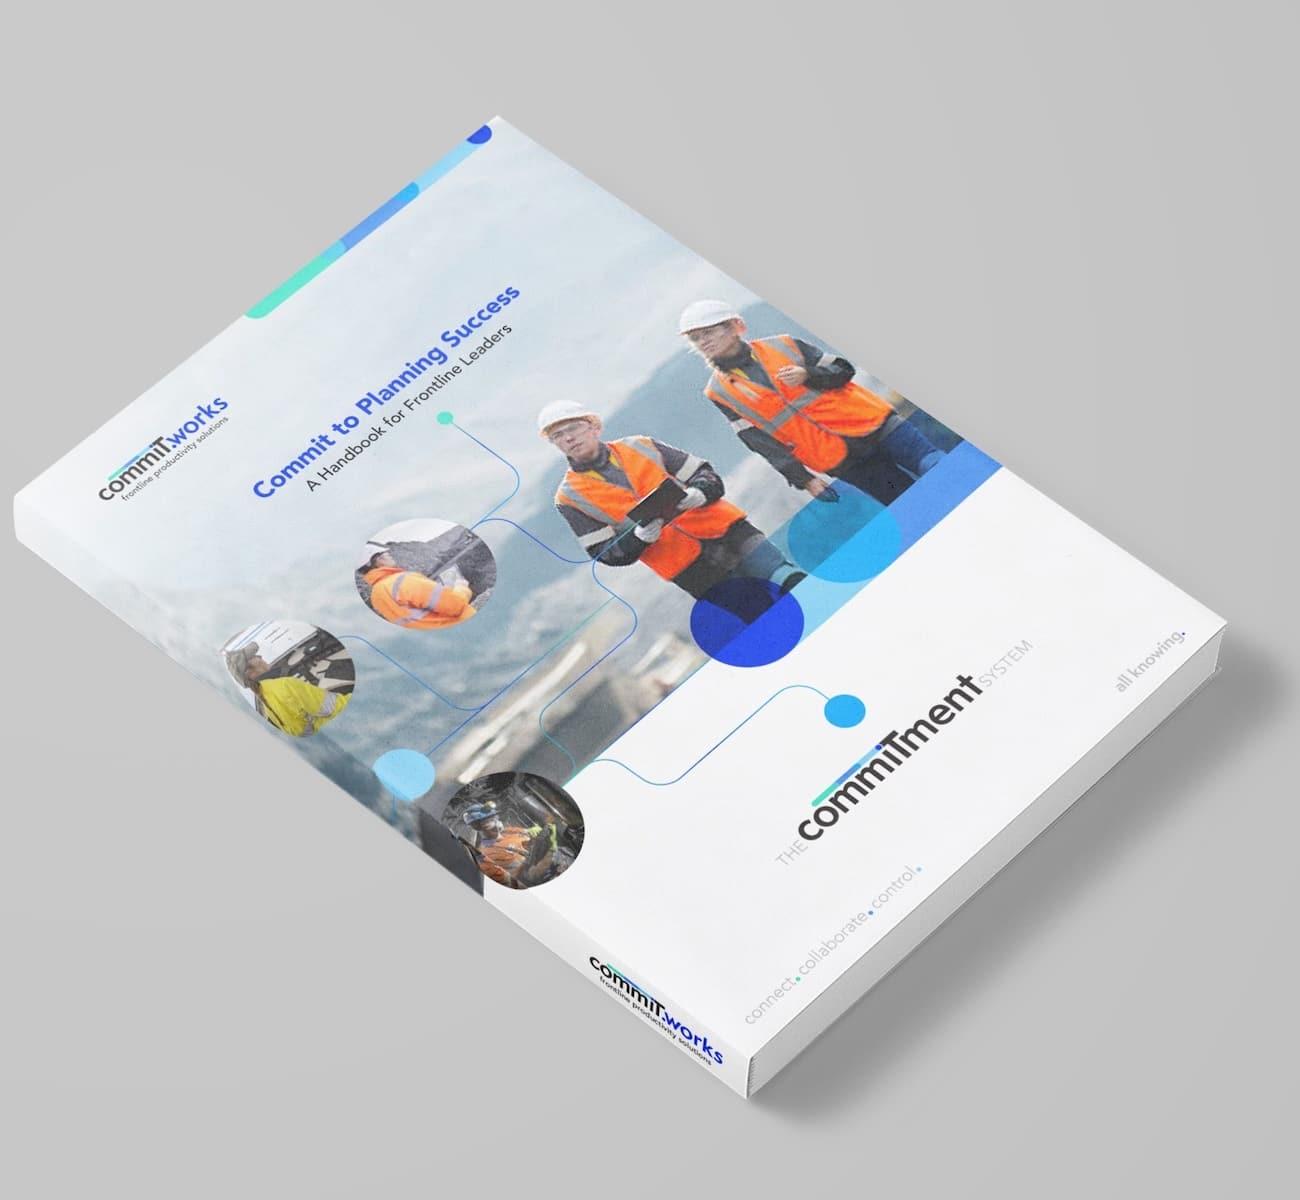 Commitment System Handbook